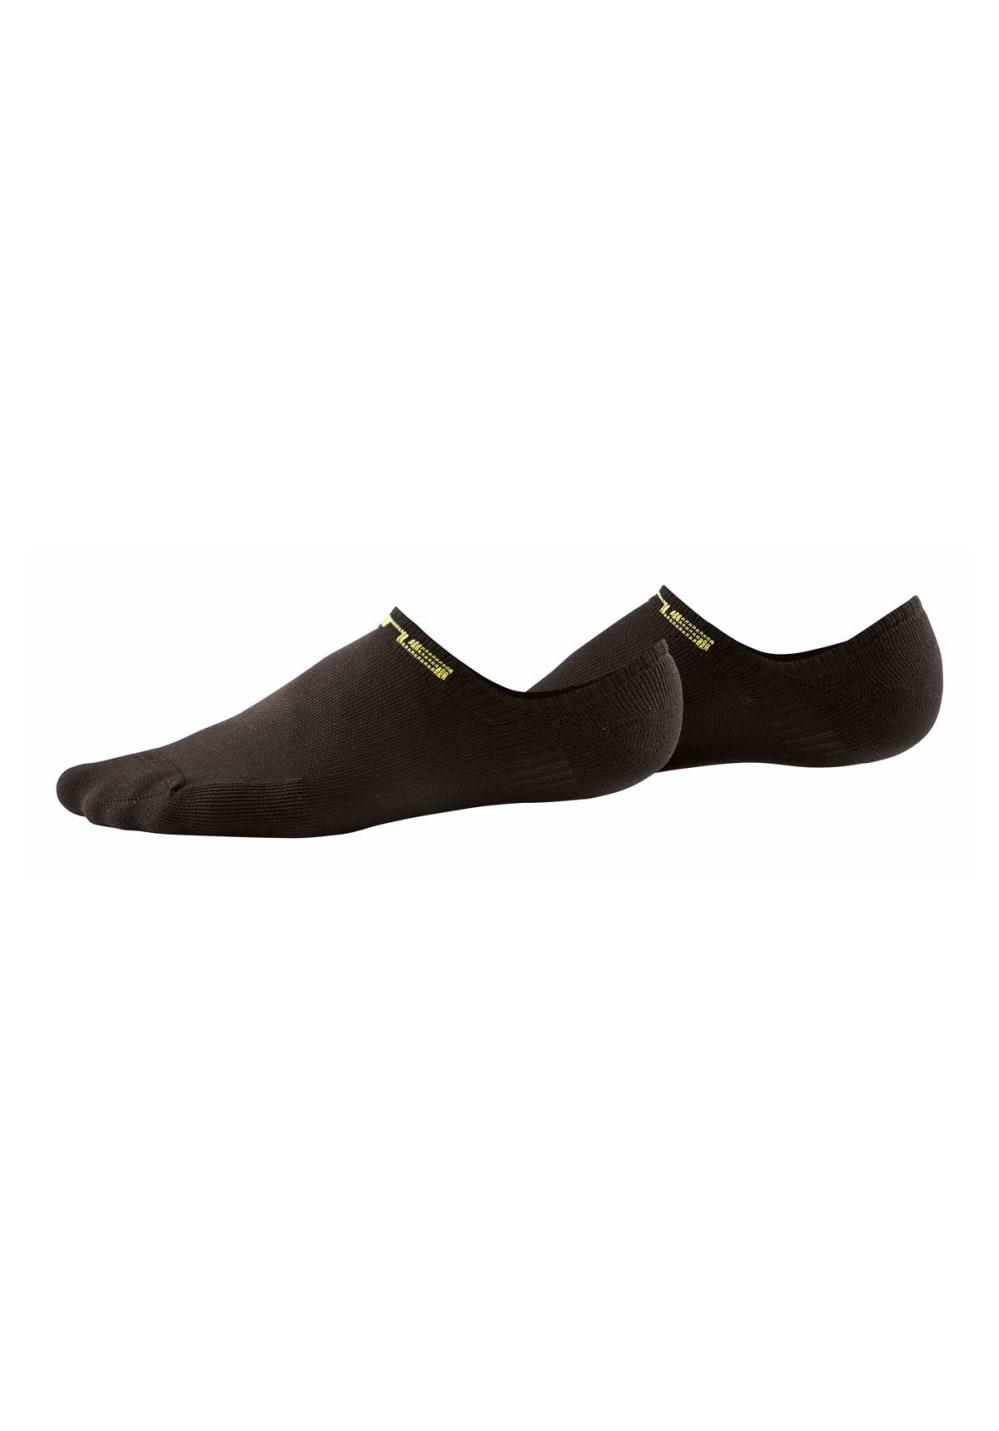 Skins Essentials Seamless Performance Socks Laufsocken - Schwarz, Gr. L